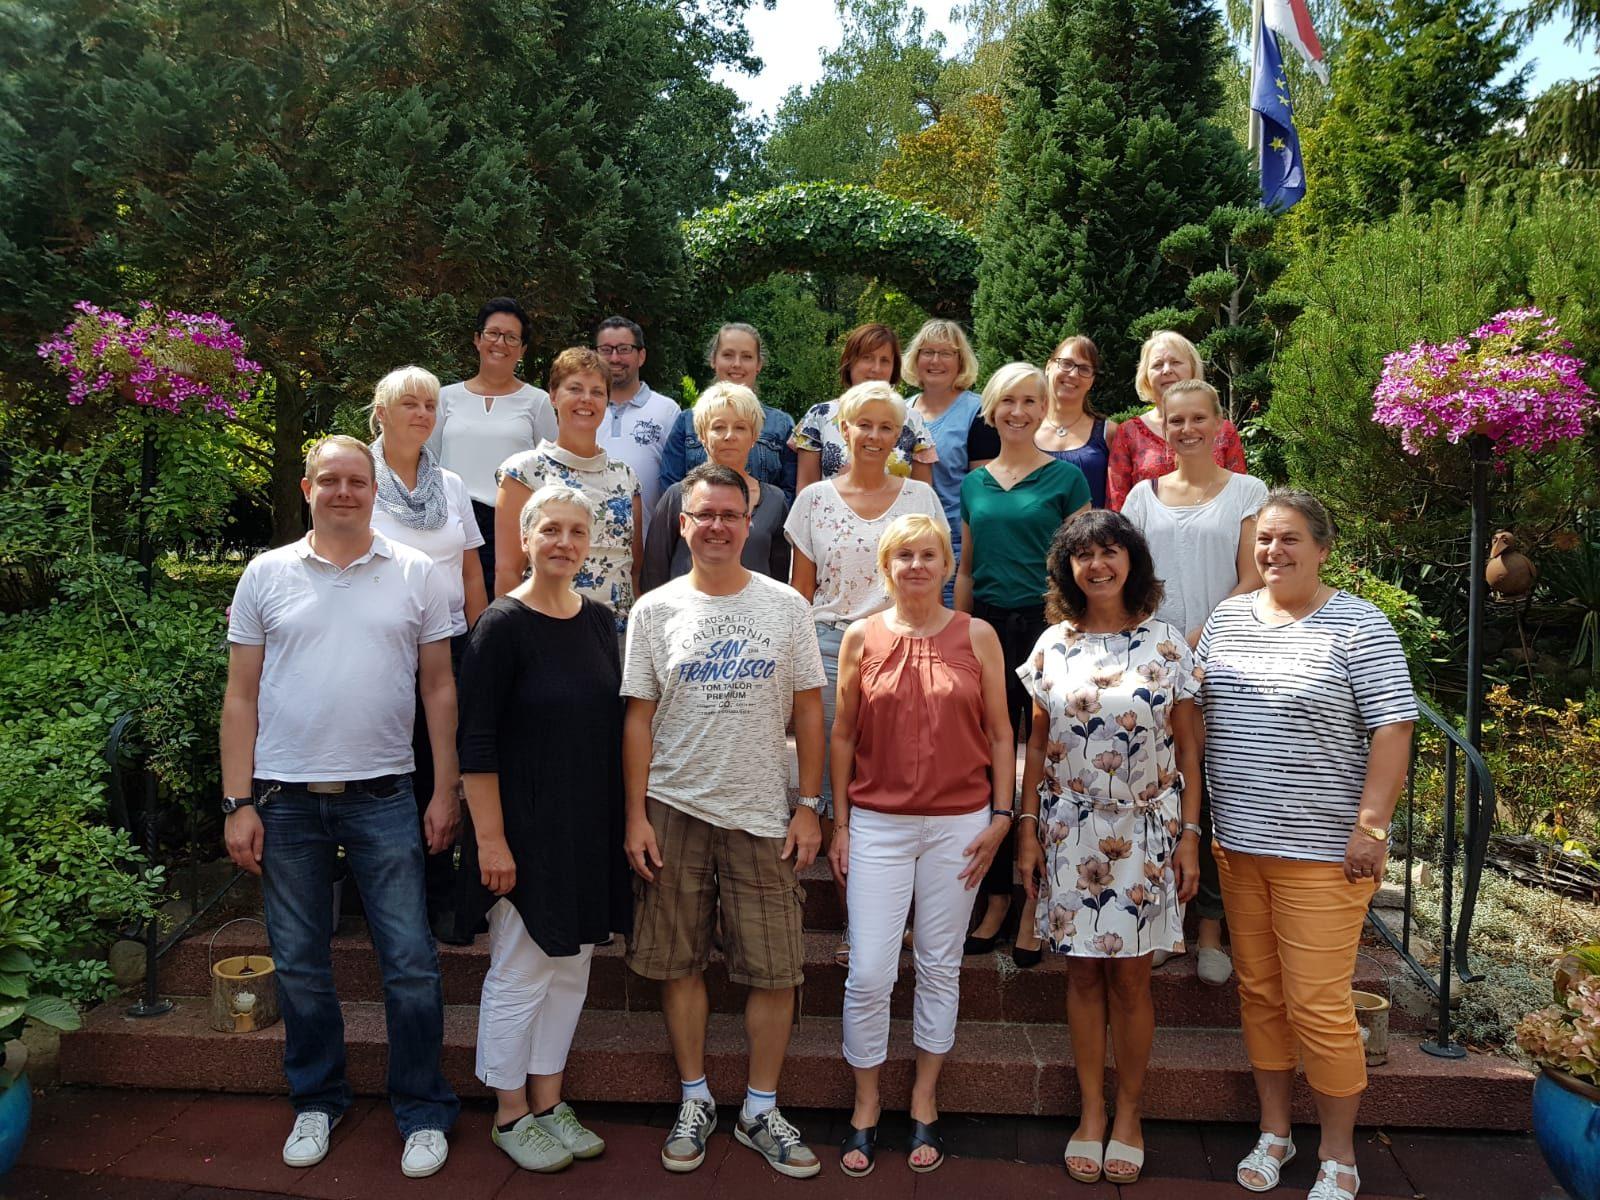 http://schule.neuseddin.de/wp-content/uploads/2016/10/Kollegium-2018_19-1600x1200.jpg